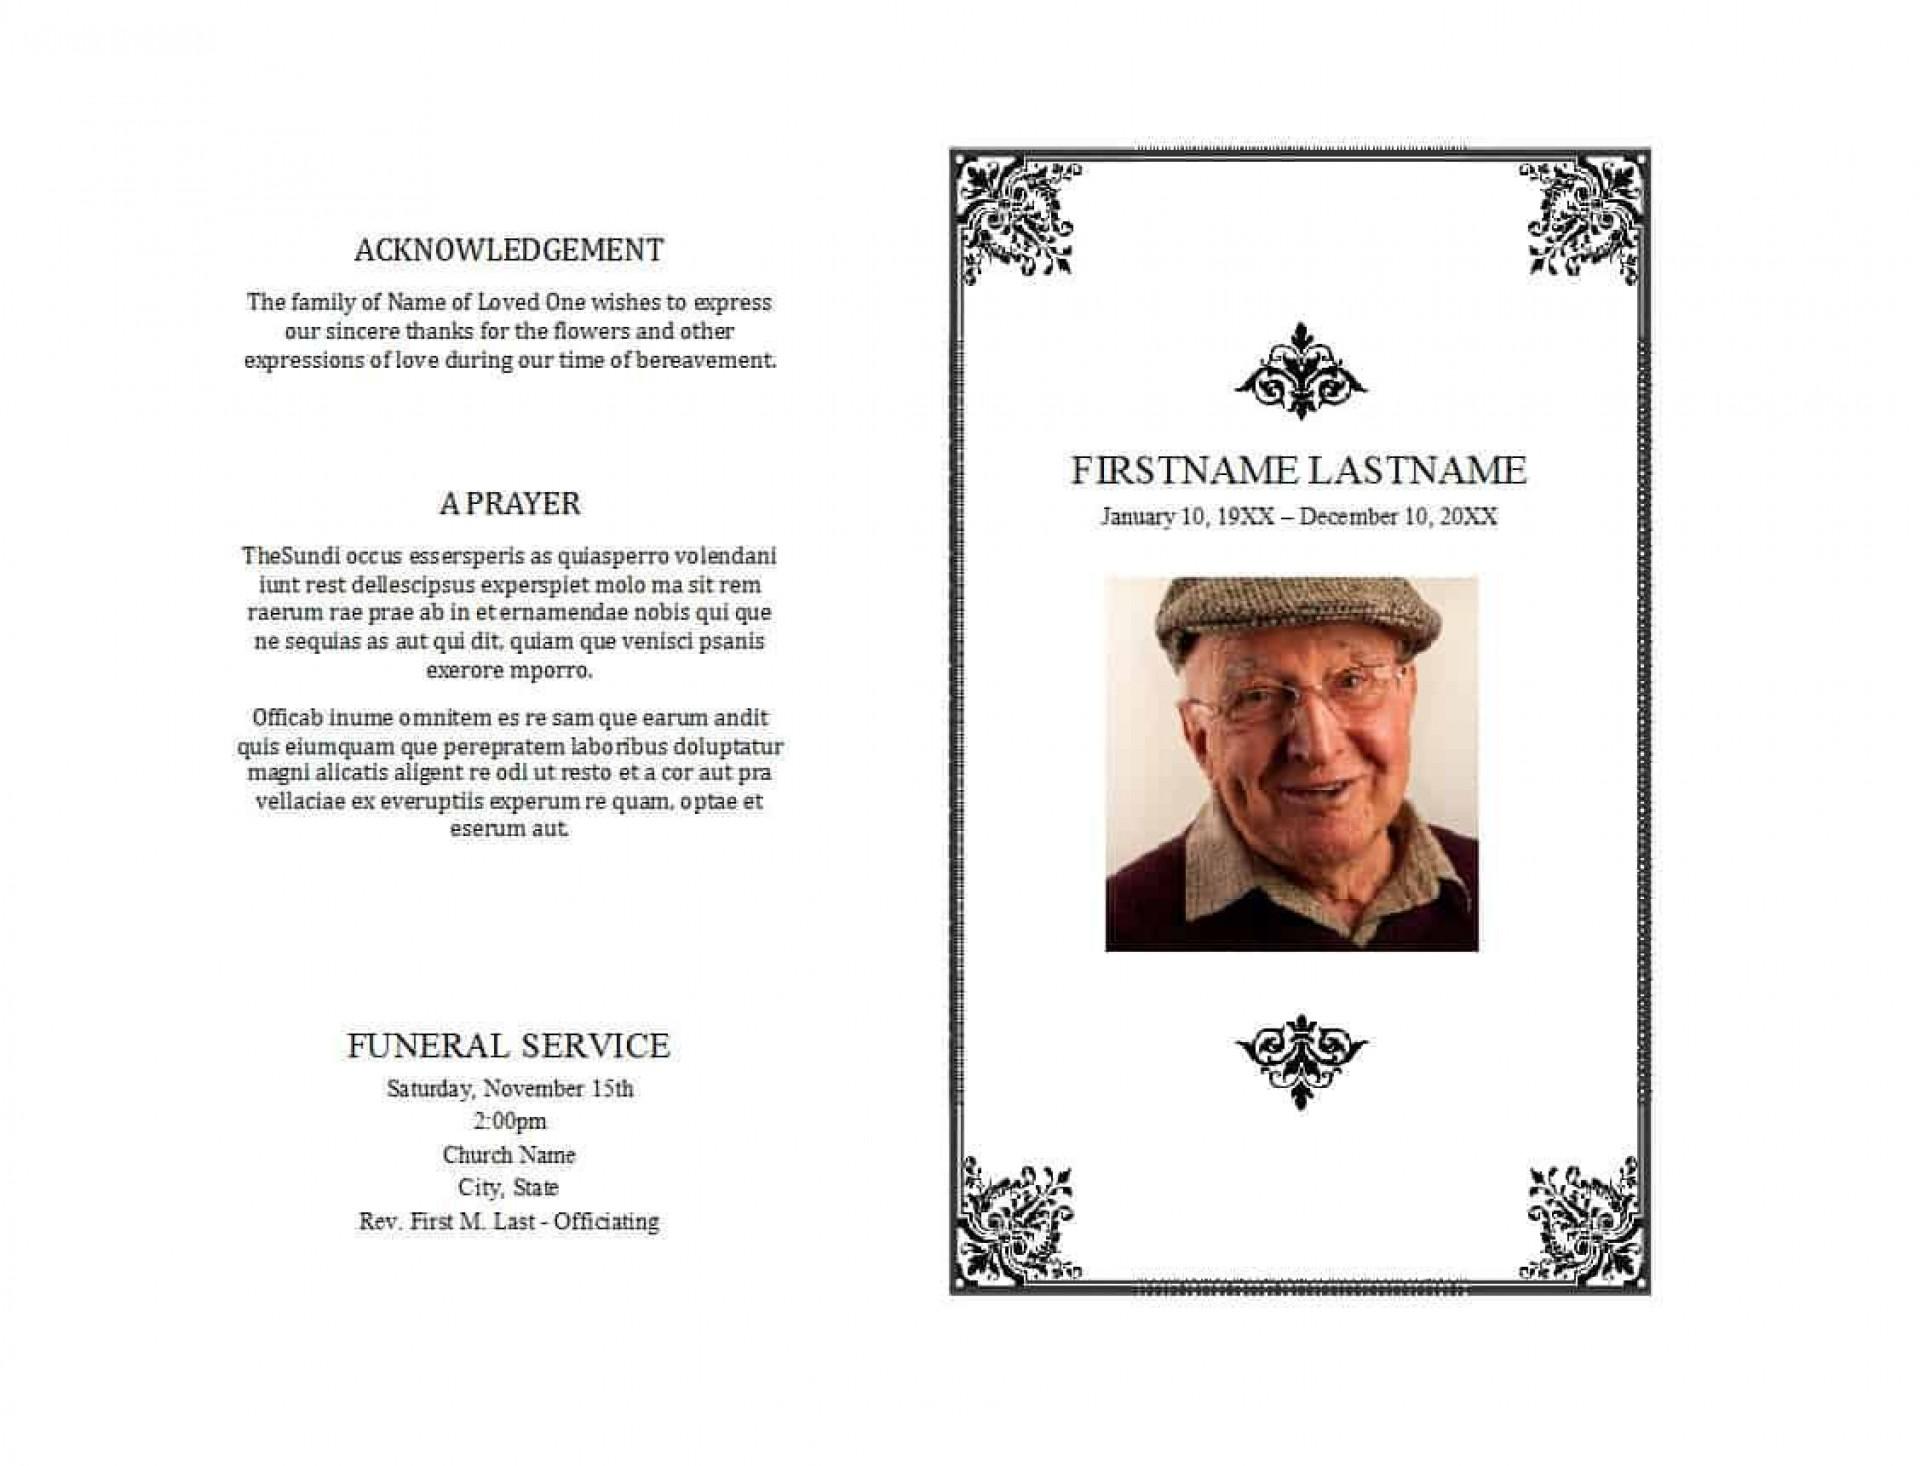 008 Impressive Template For Funeral Programme Image  Sample Mas Program Word1920